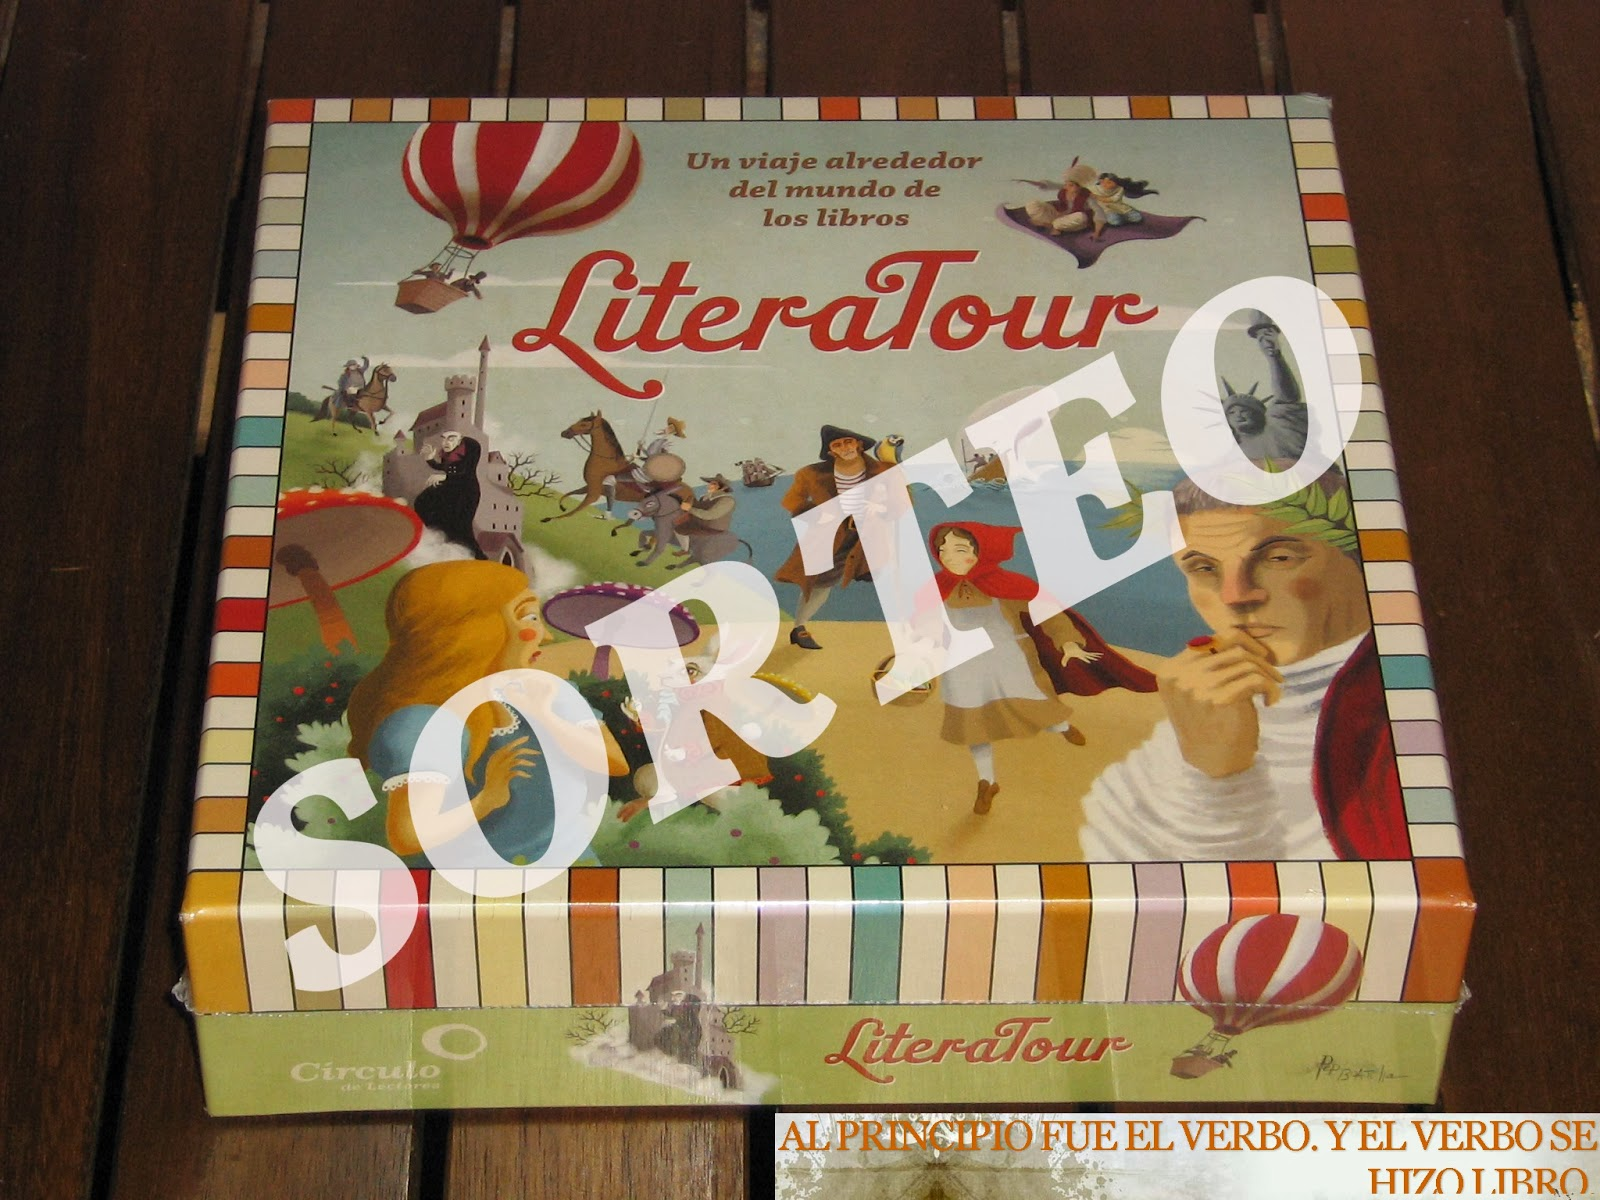 http://contandoteunlibro.blogspot.com.es/2014/02/sorteo-literatour.html